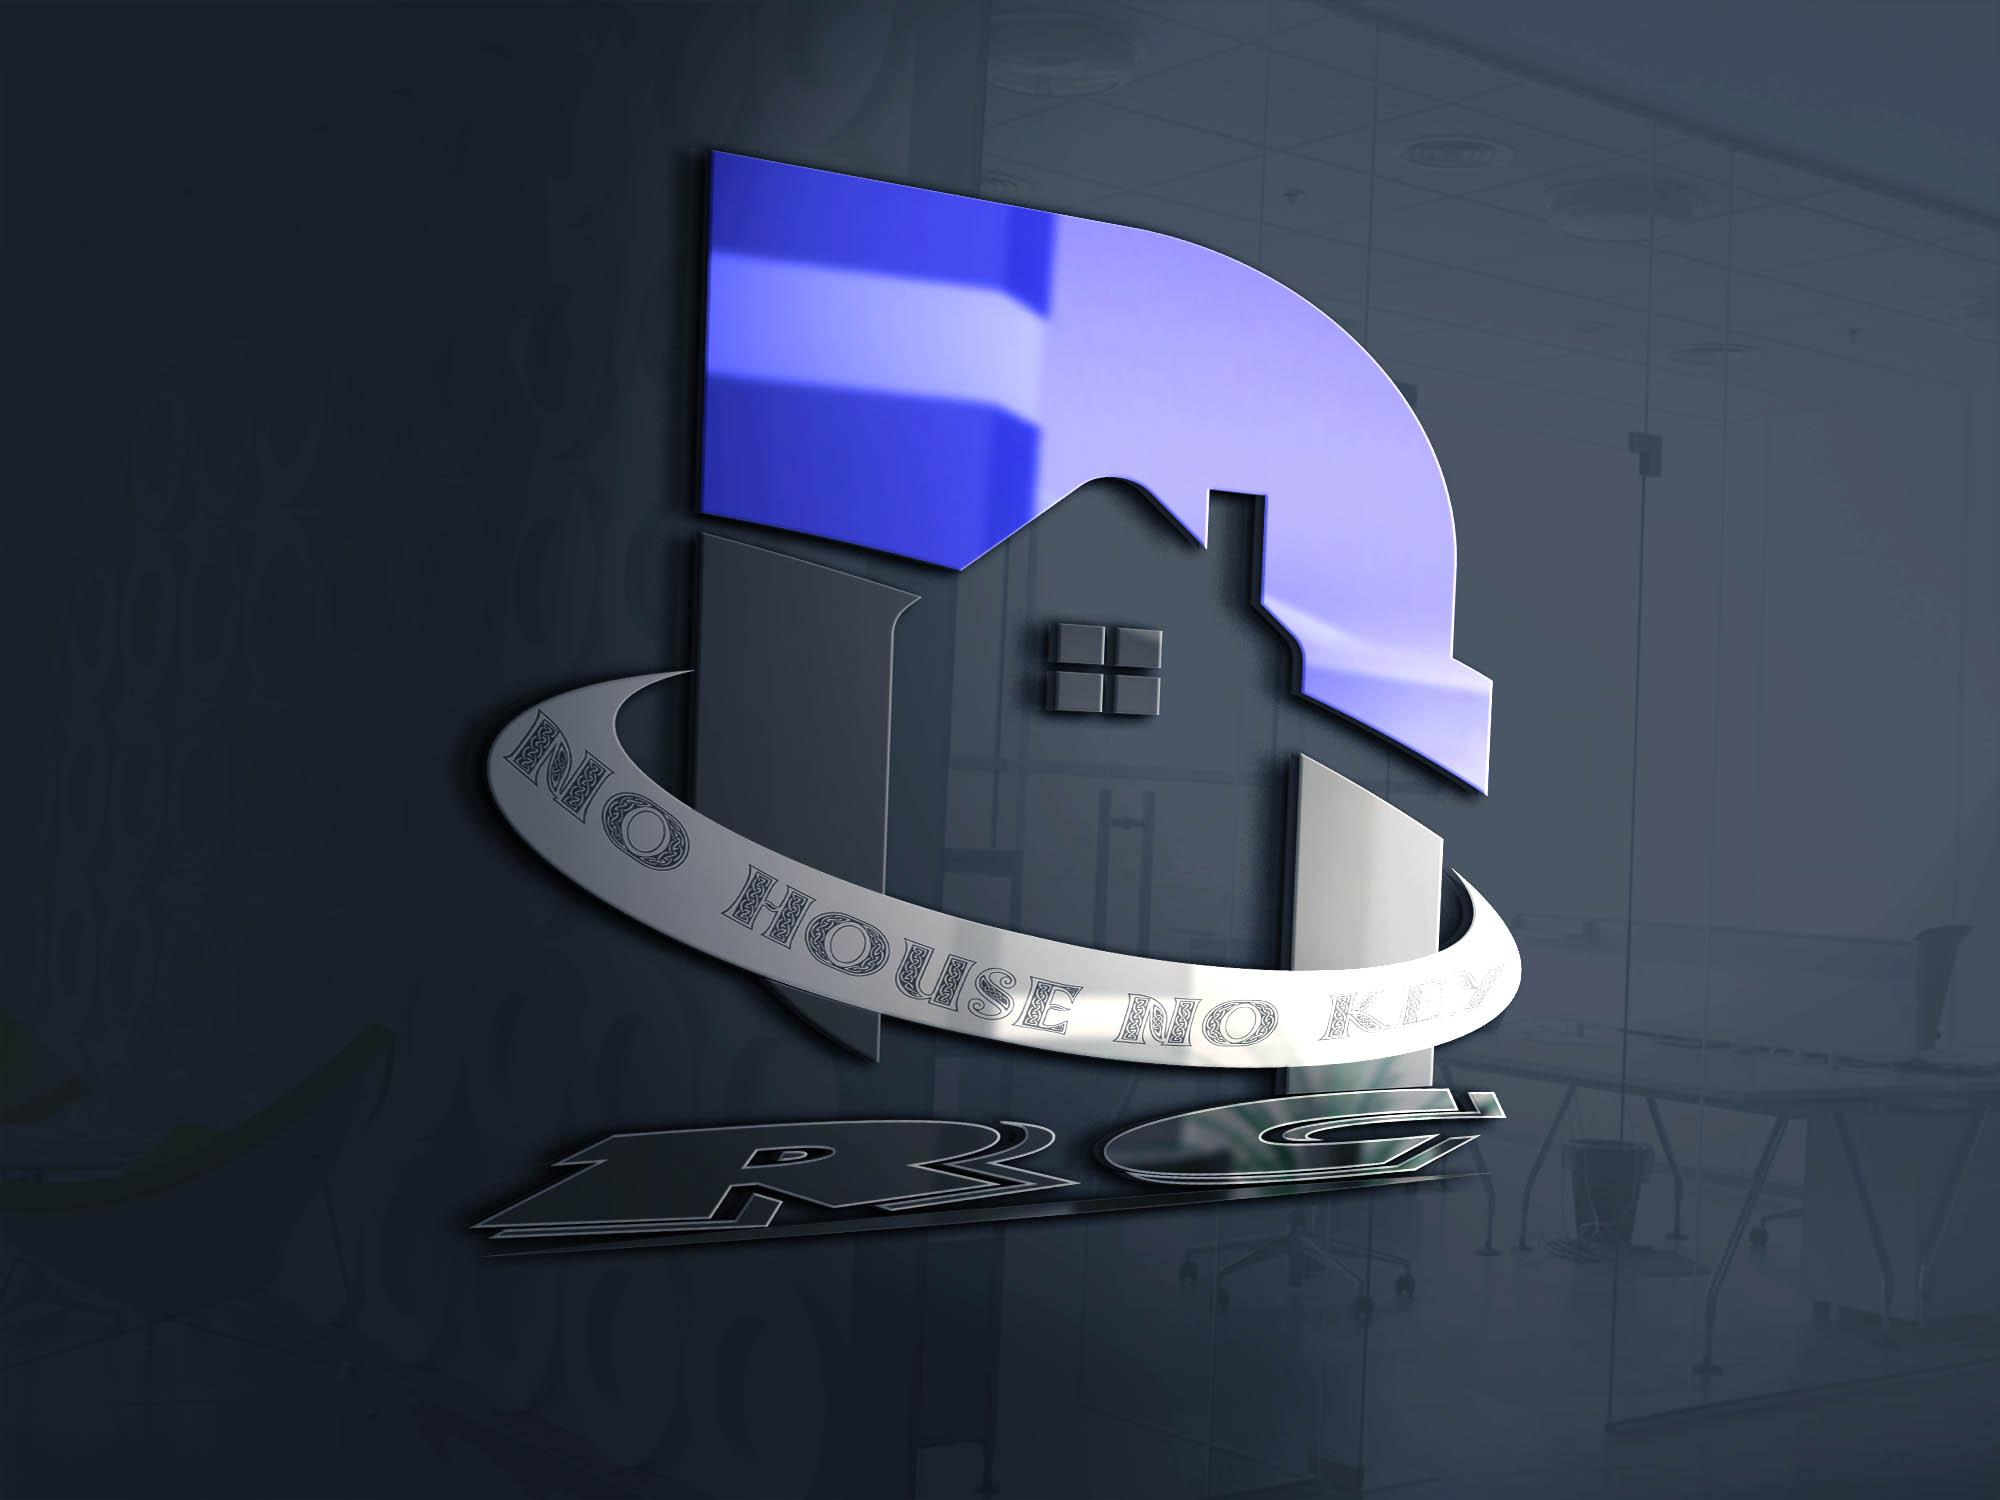 I create a logo in my creativity.